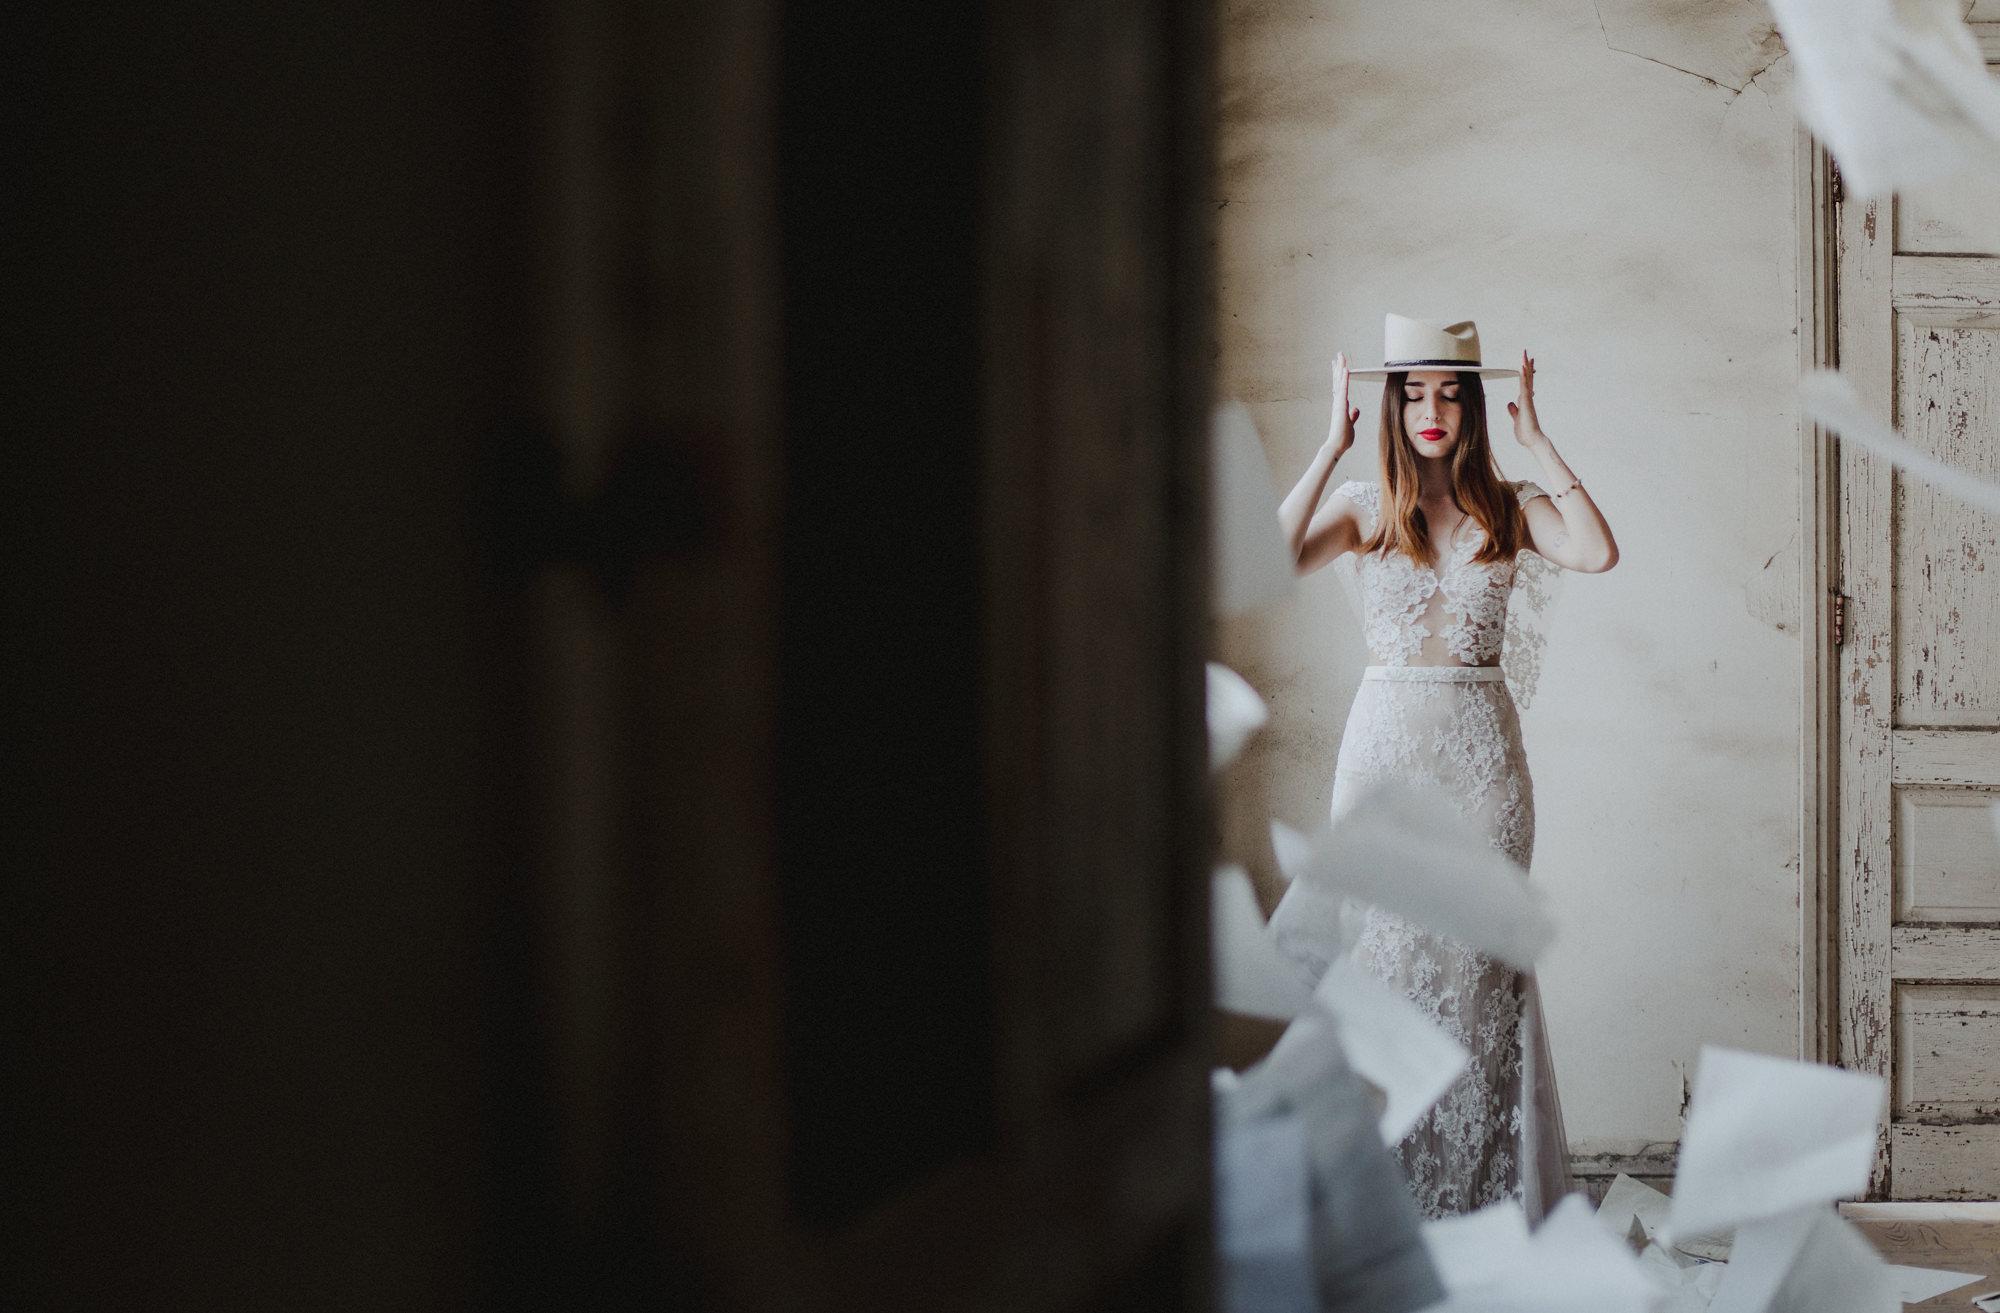 Creative portrait of bride wearing white hat by Fer Juaristi